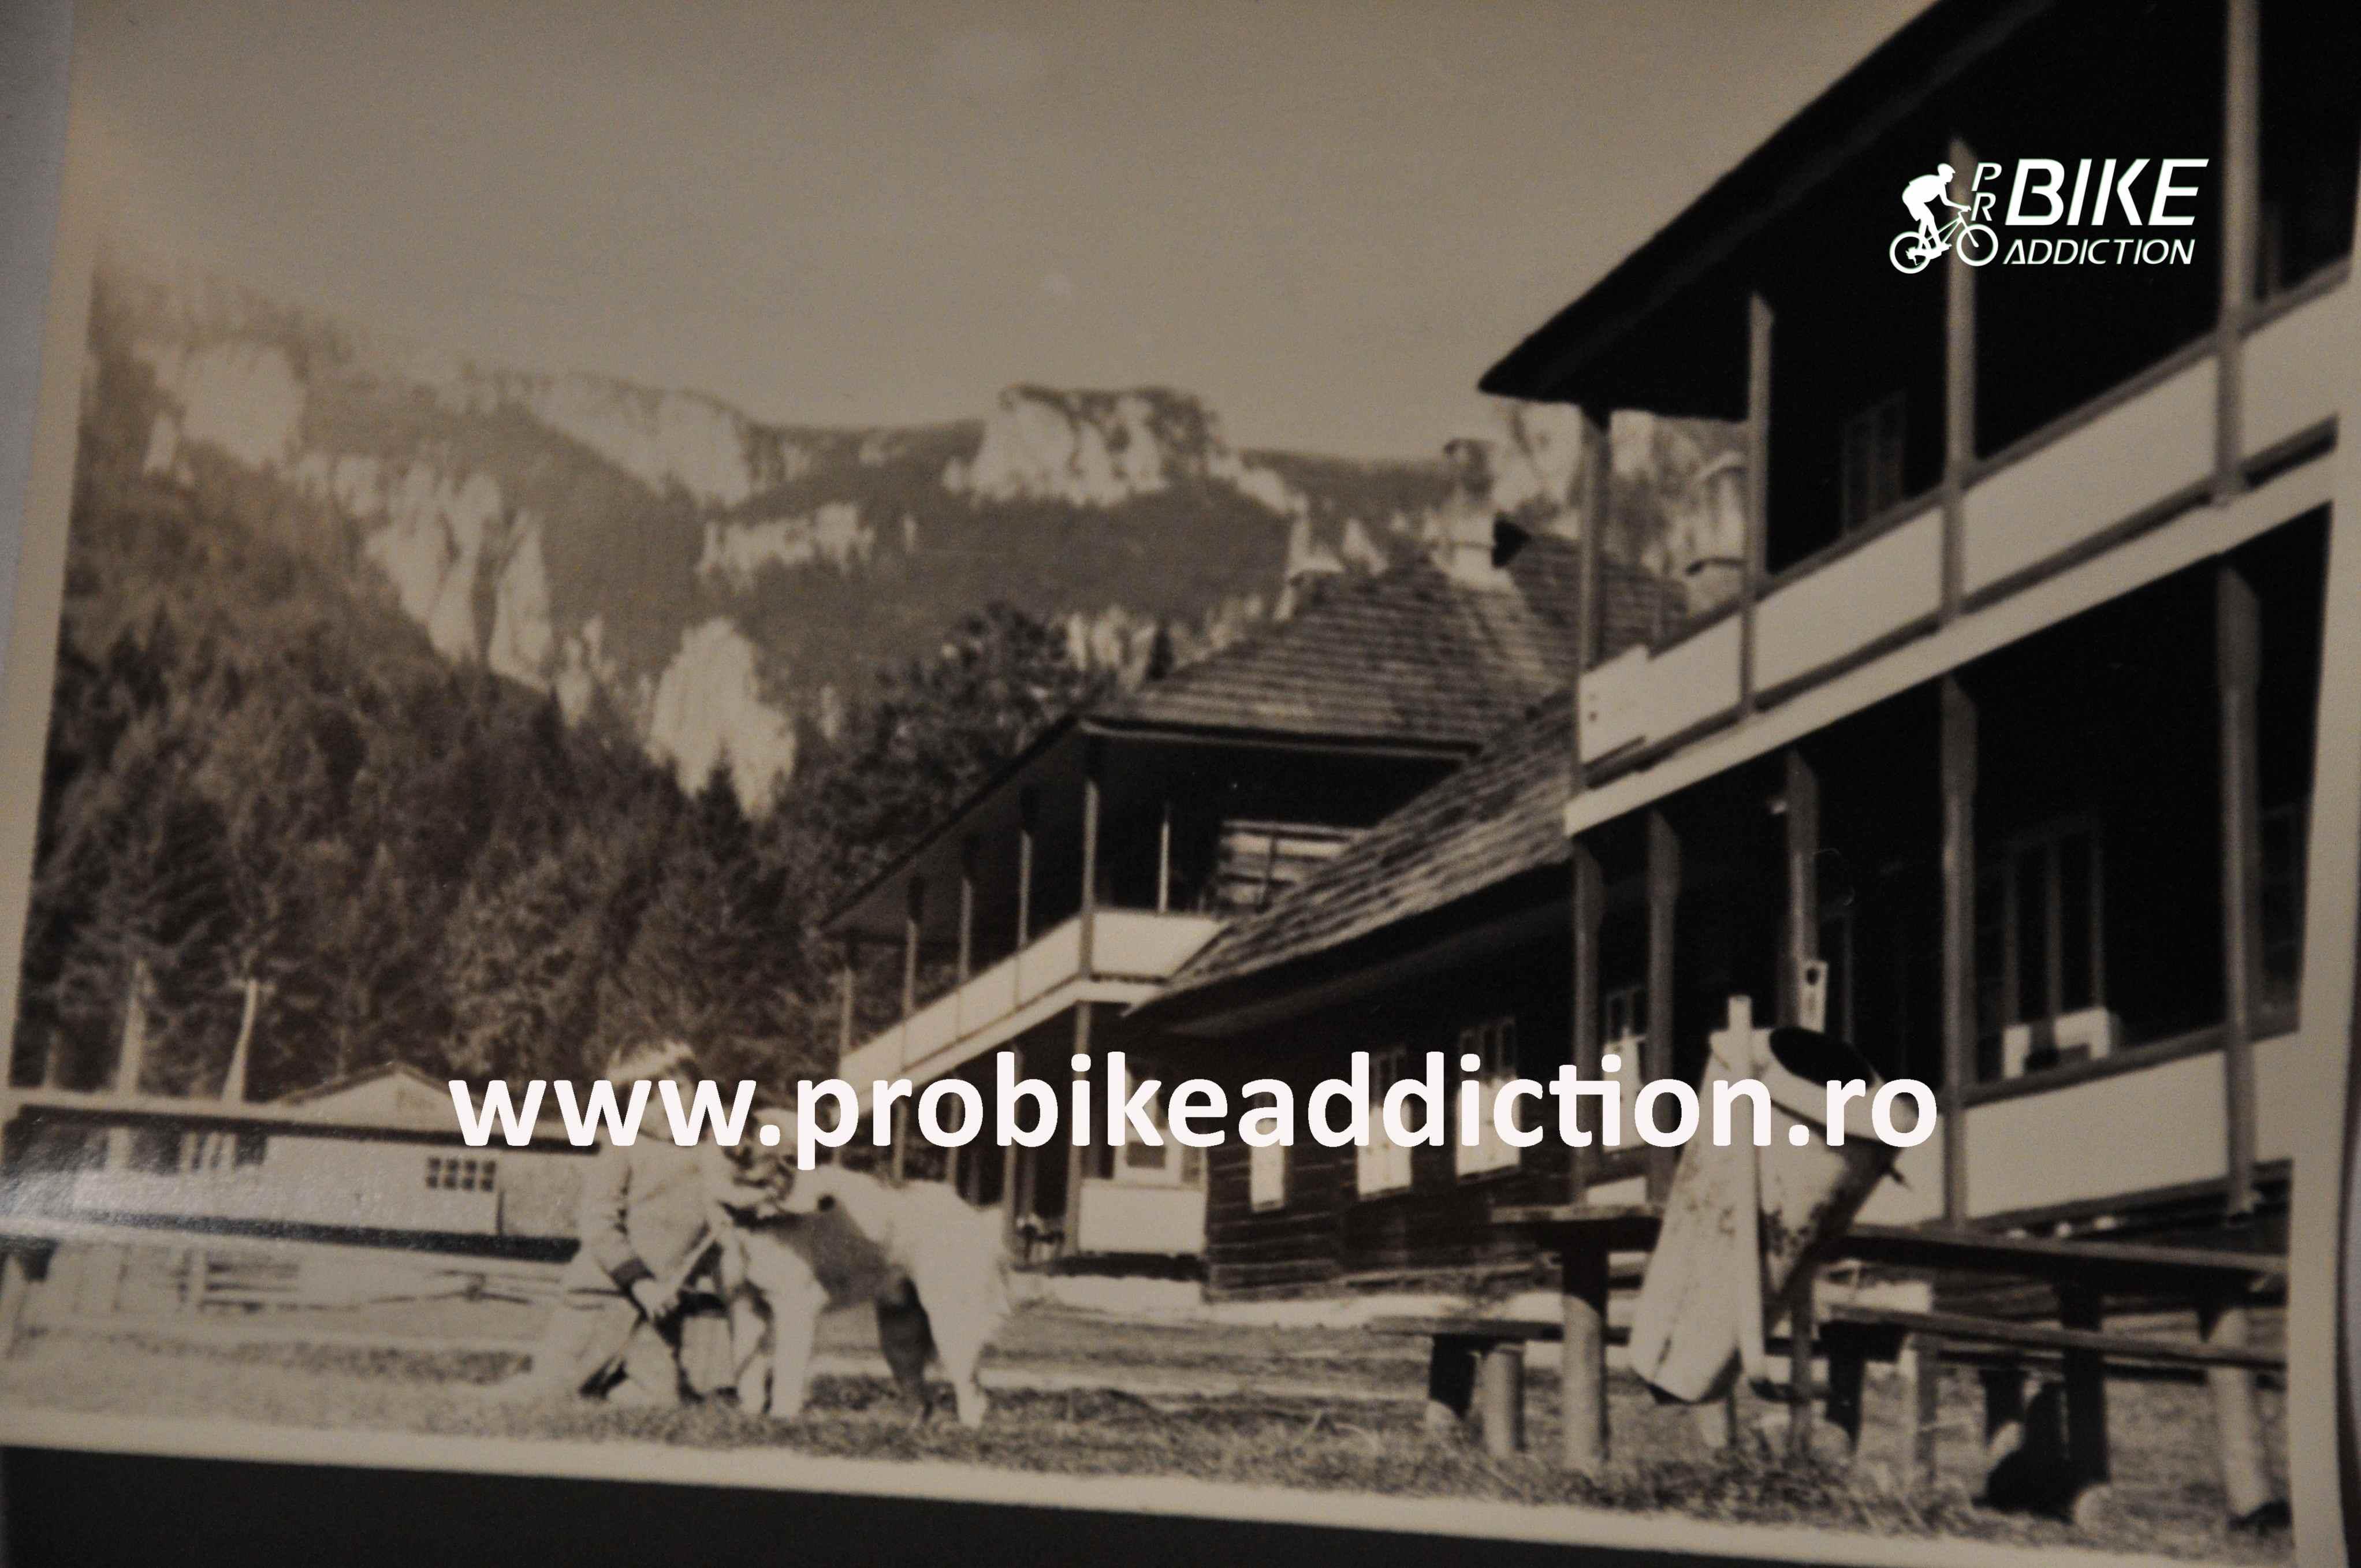 probikeaddiction cabana izvorul muntelui ceahlau anii 80 fotografii document